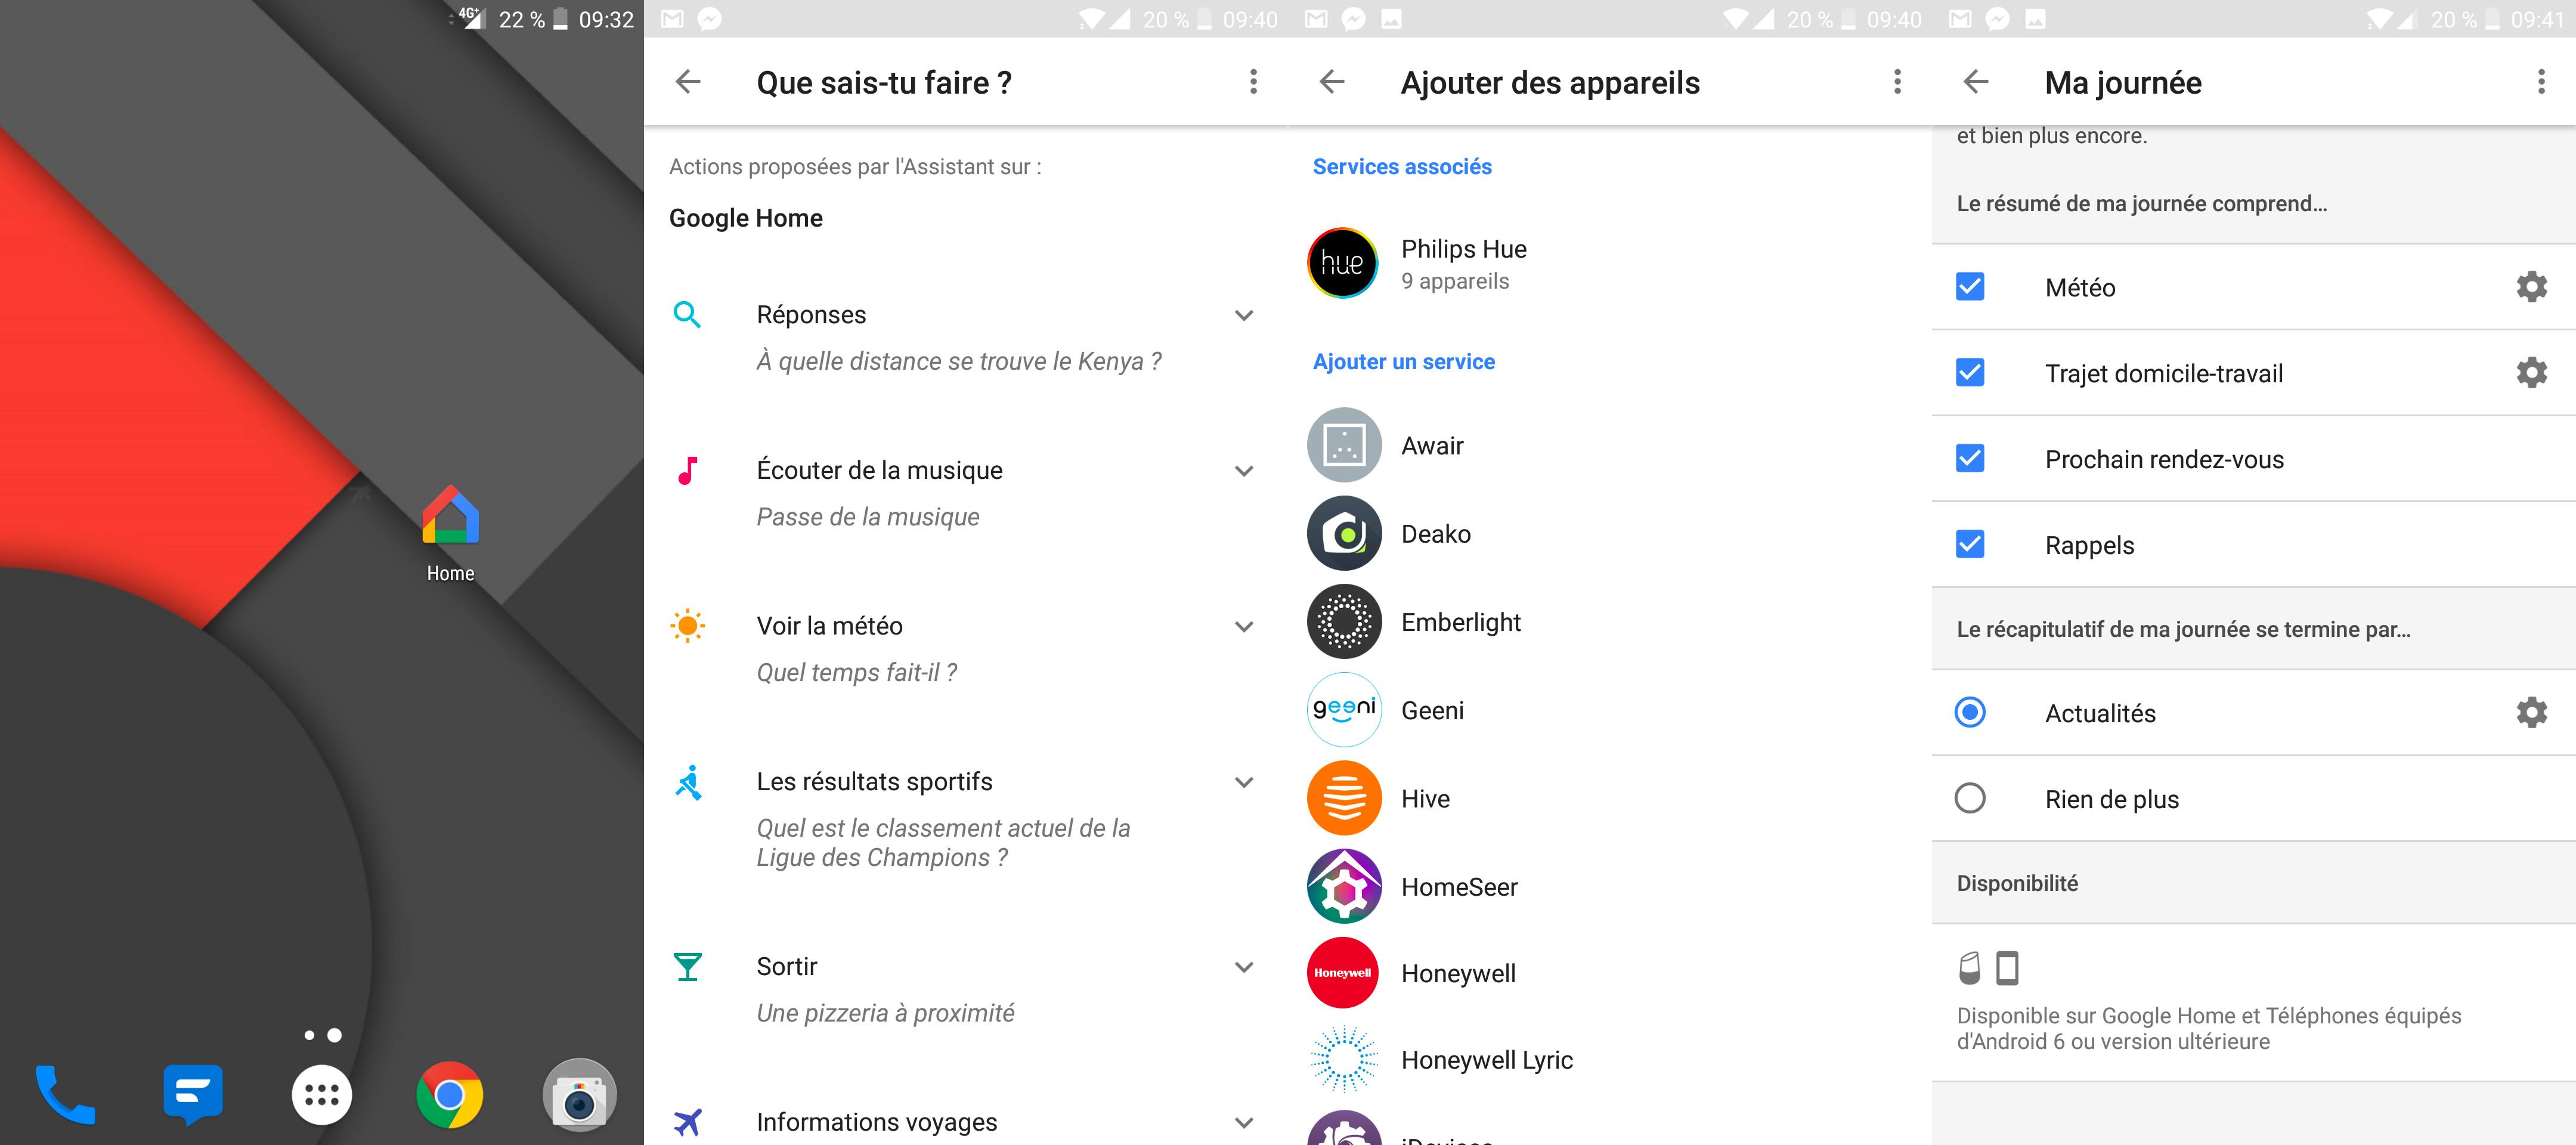 L'application du Google Home